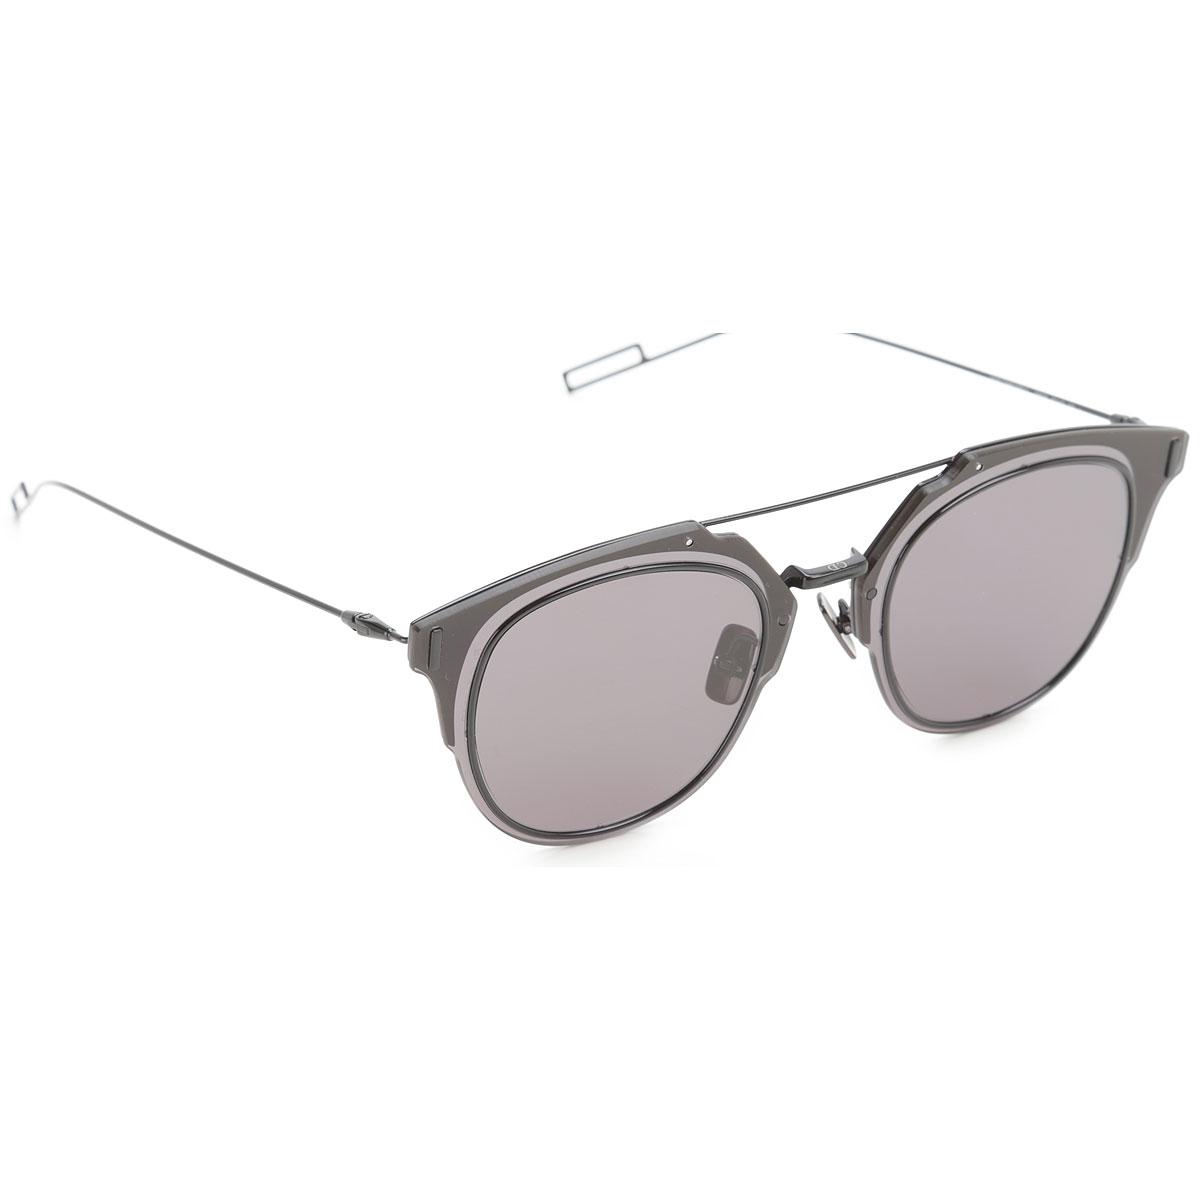 d0e981378 نظارات شمسية, رمز القطعة: diorcomposit1.0-0062k-